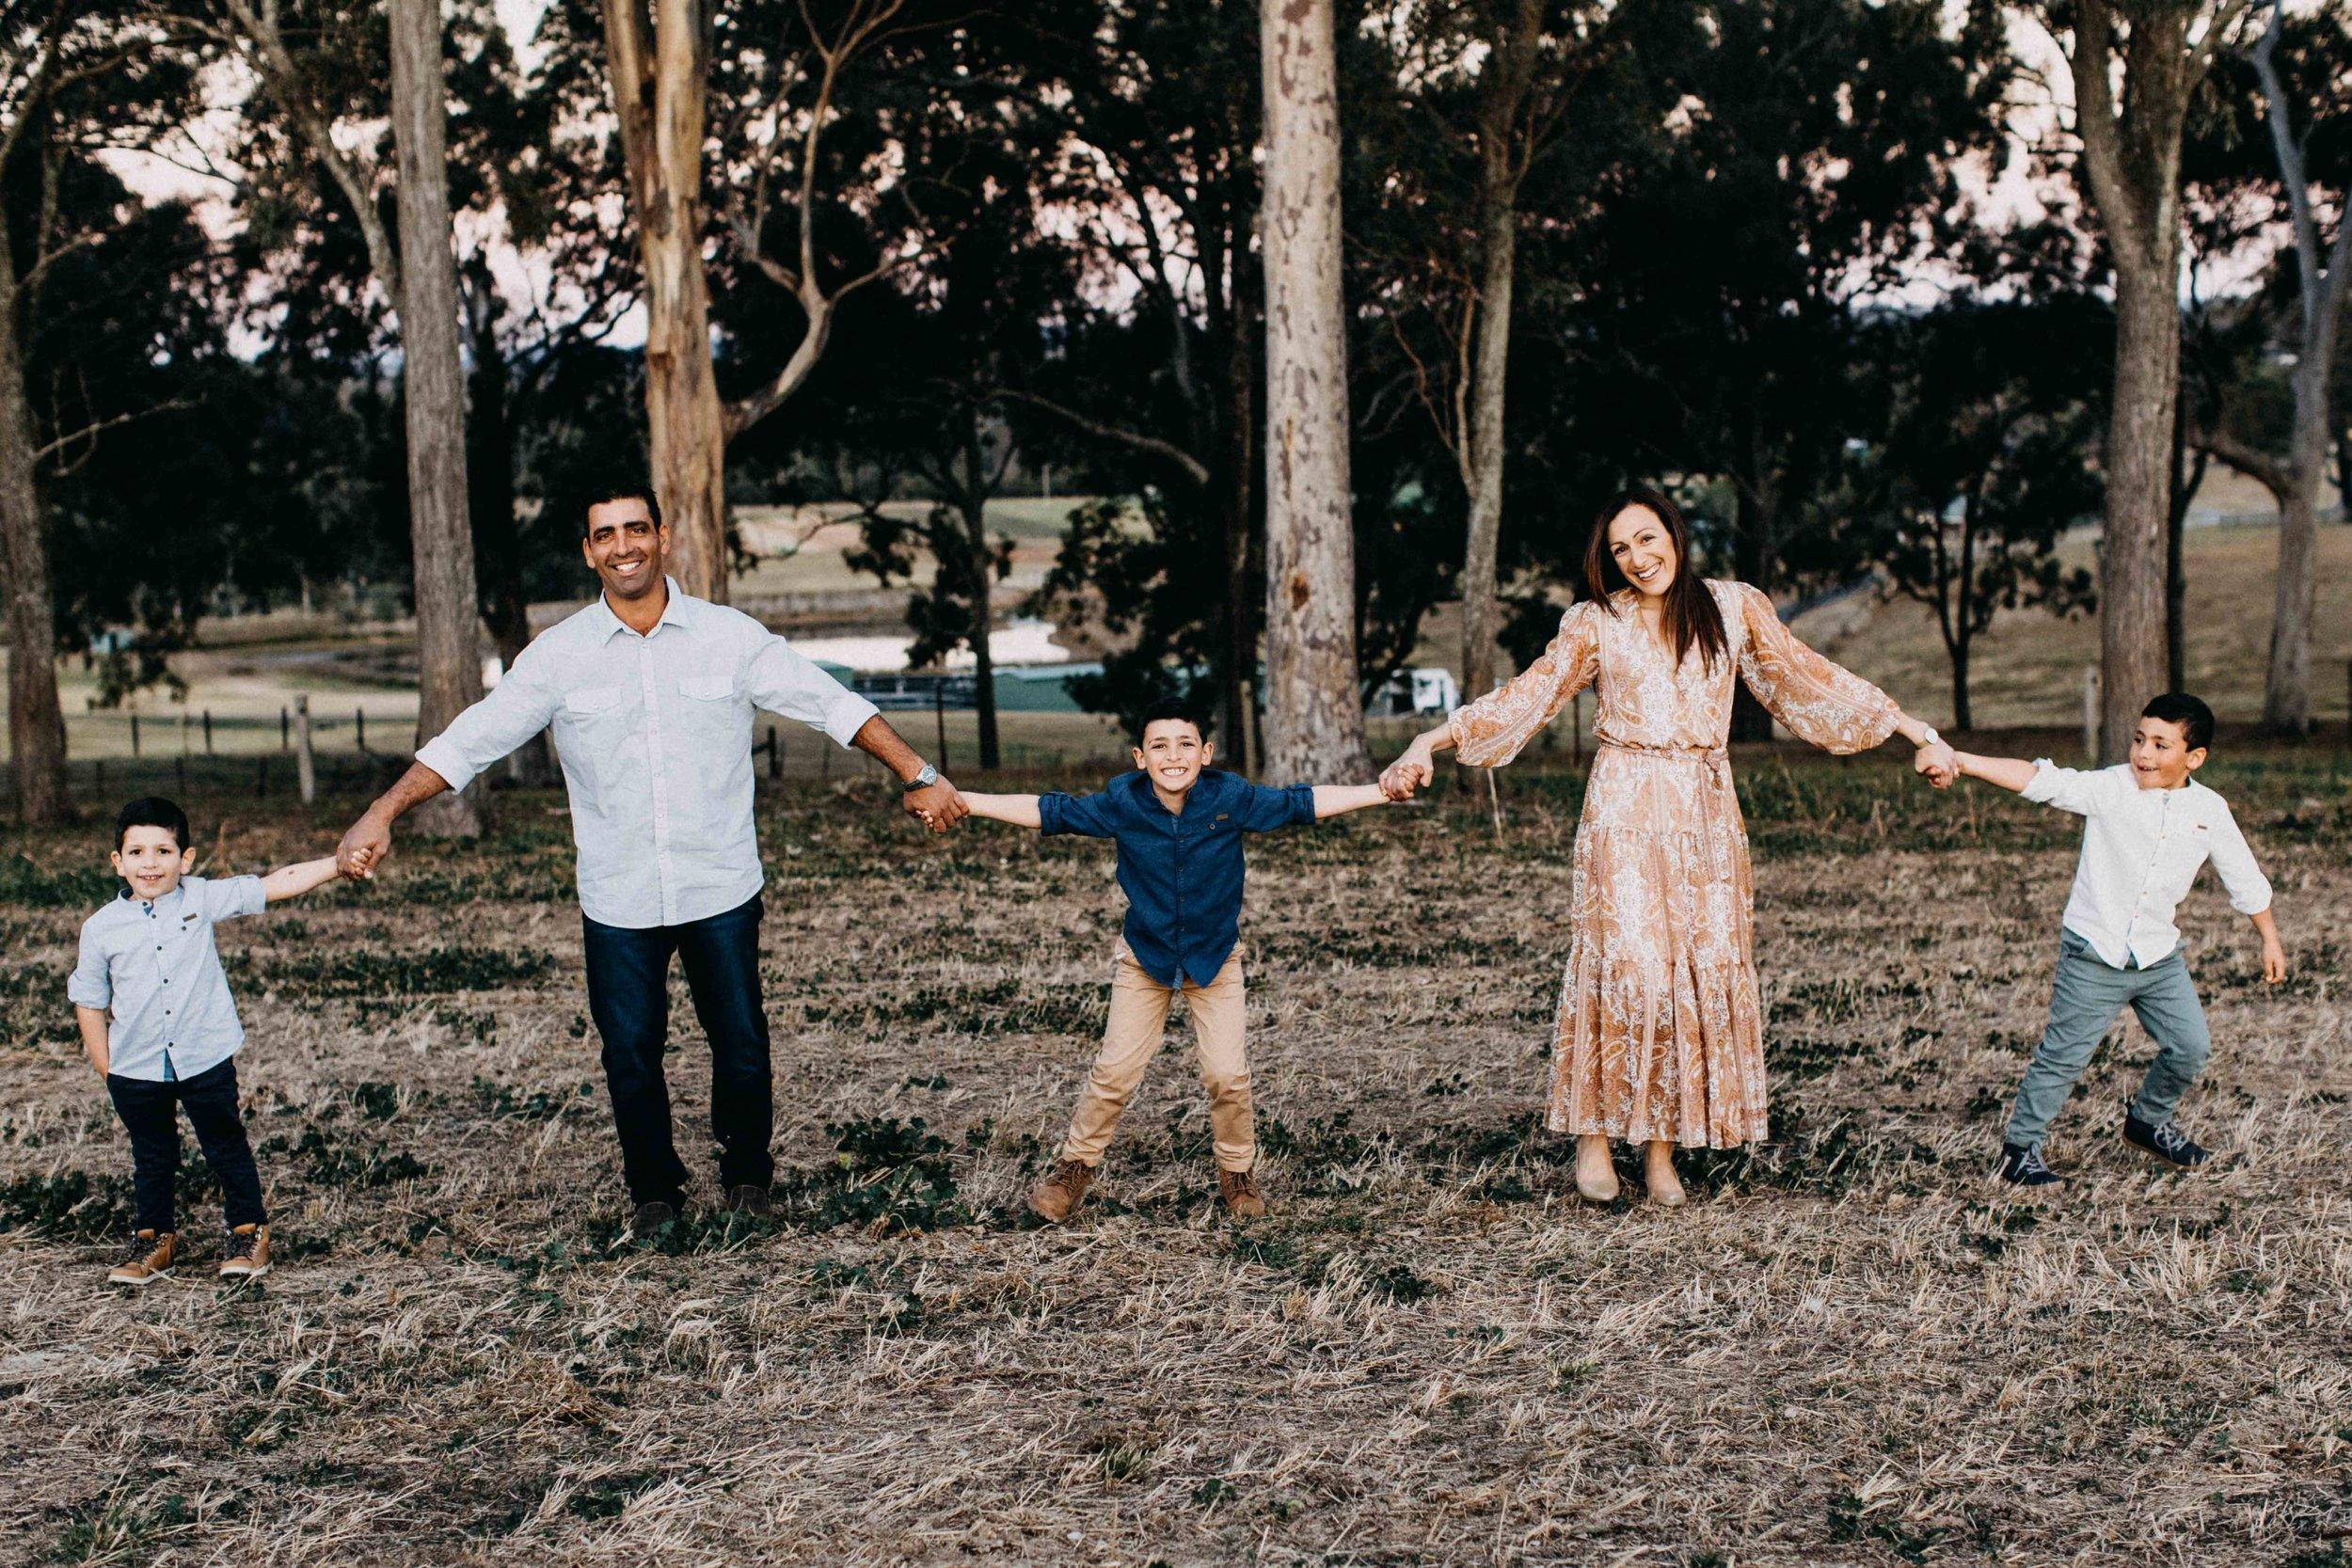 camden-family-photography-galea-www.emilyobrienphotography.net-52.jpg